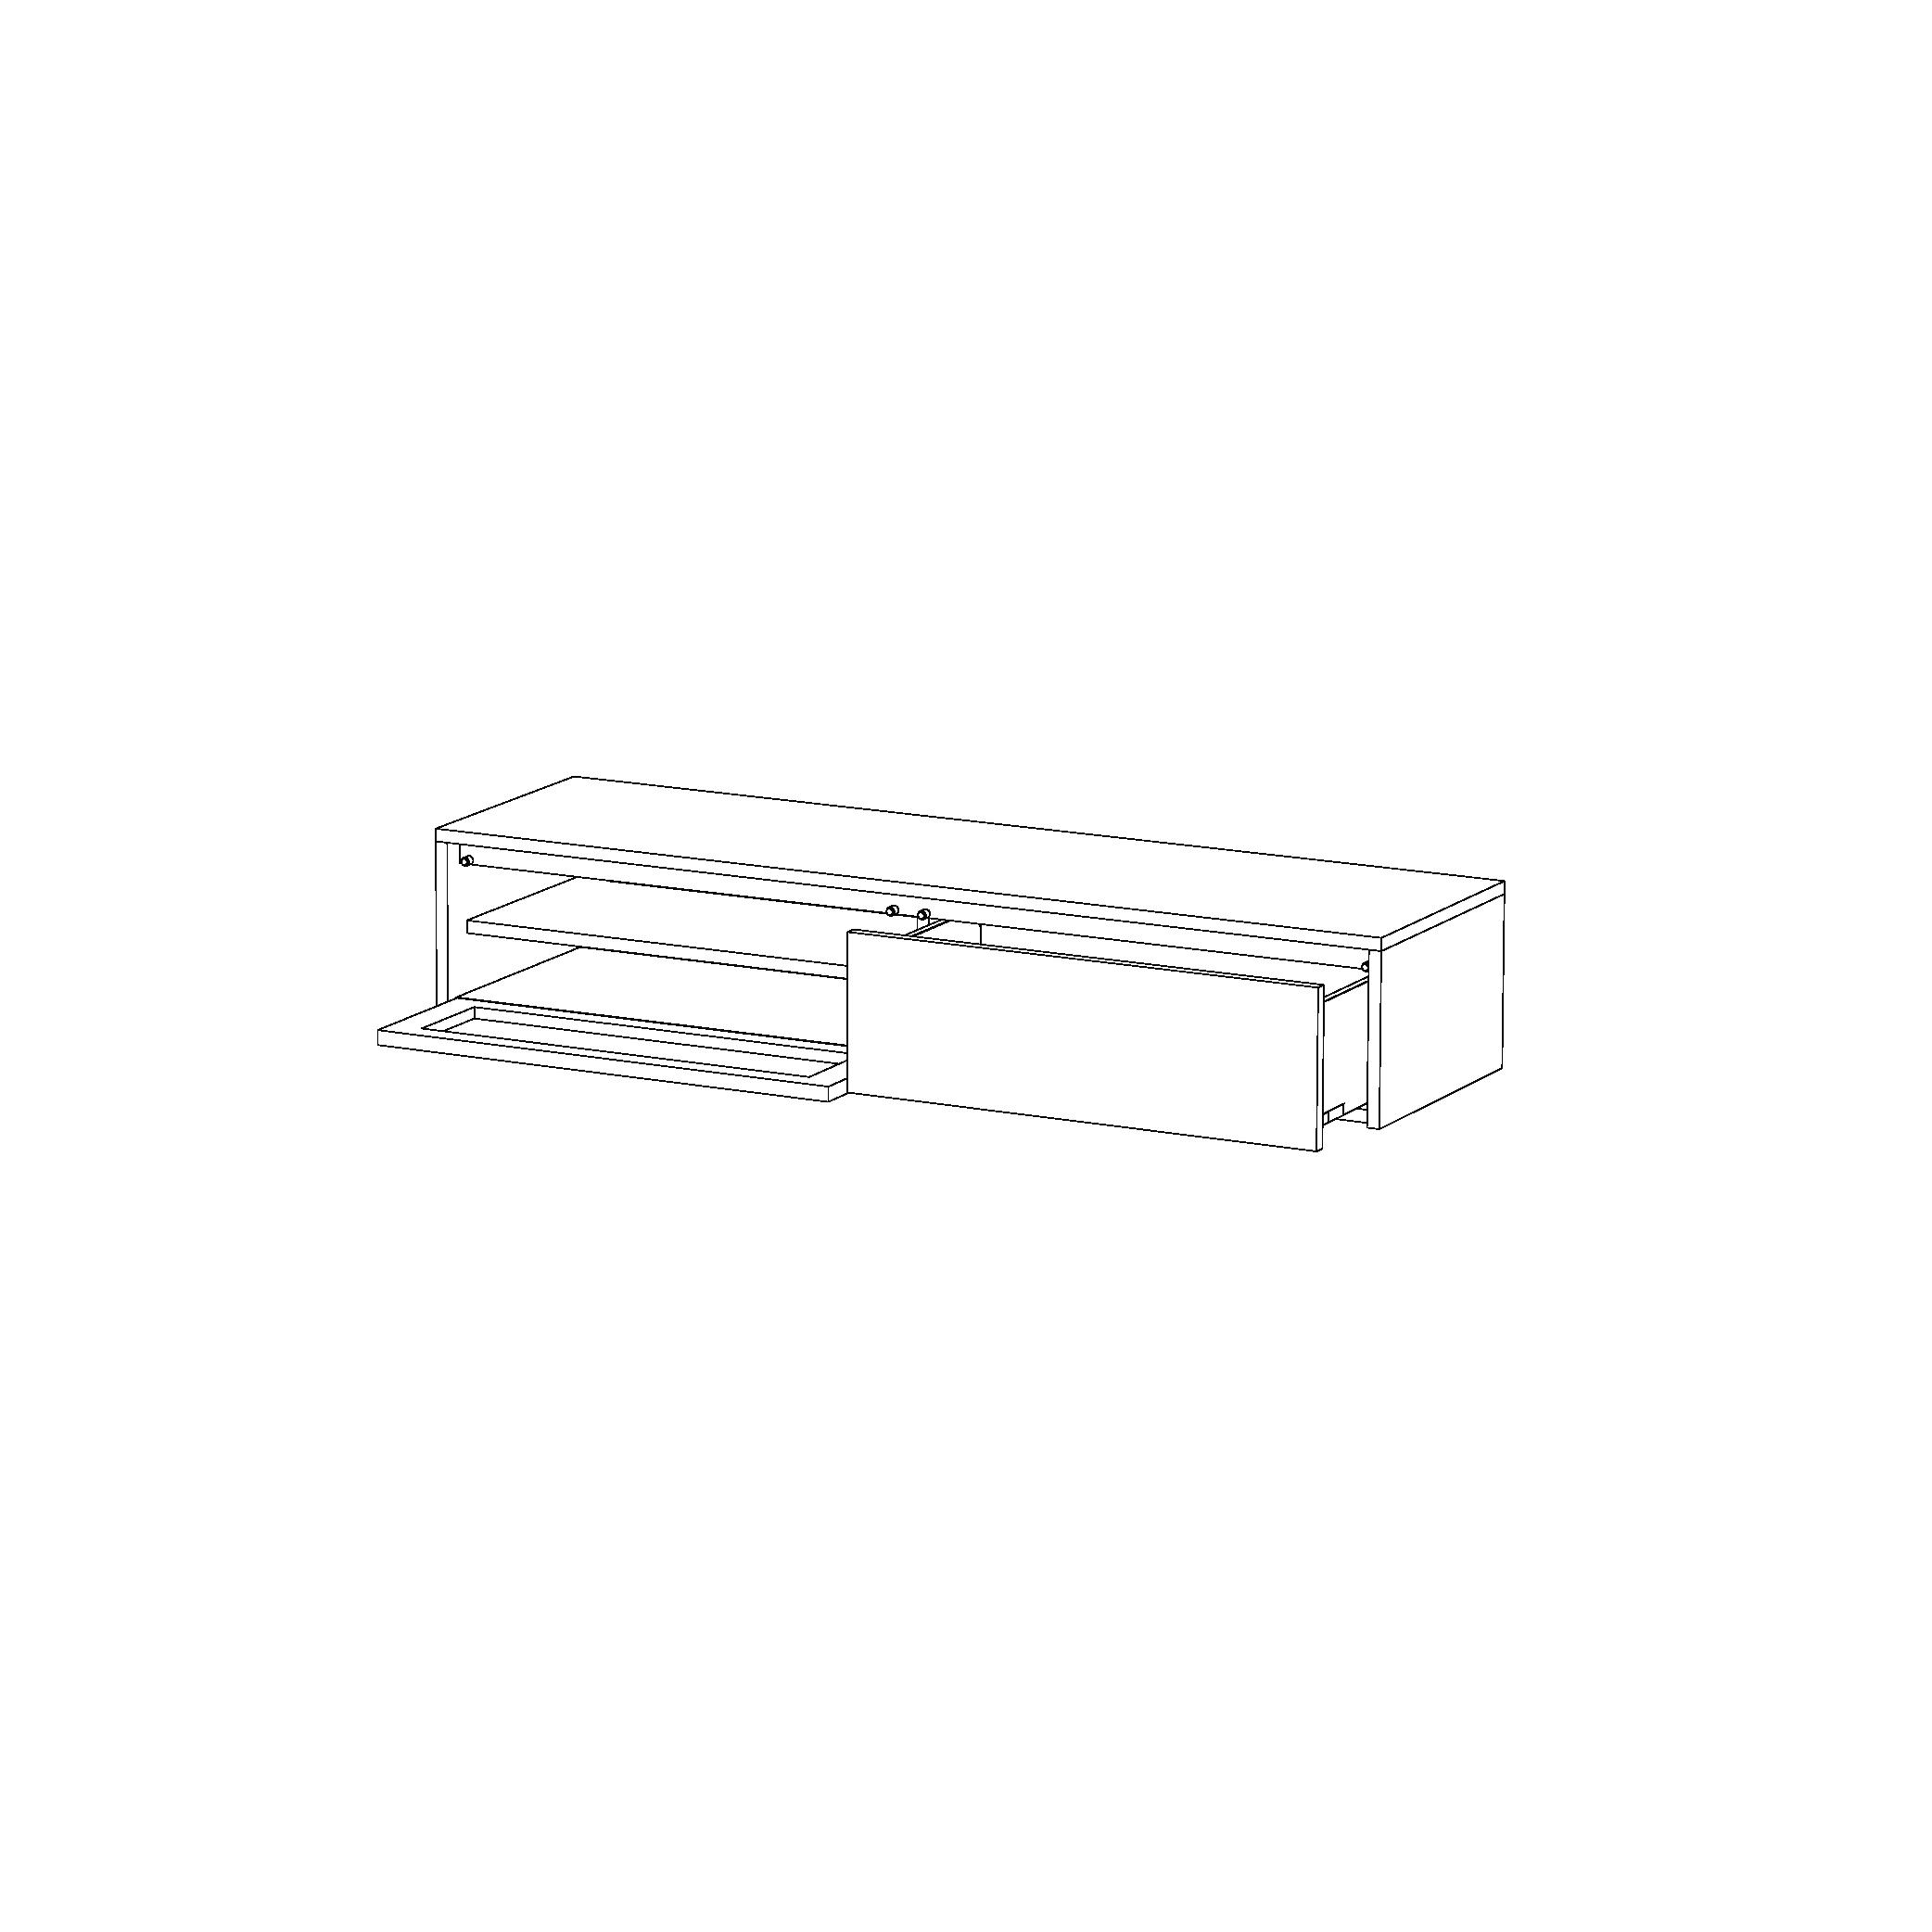 WATCH 1/6